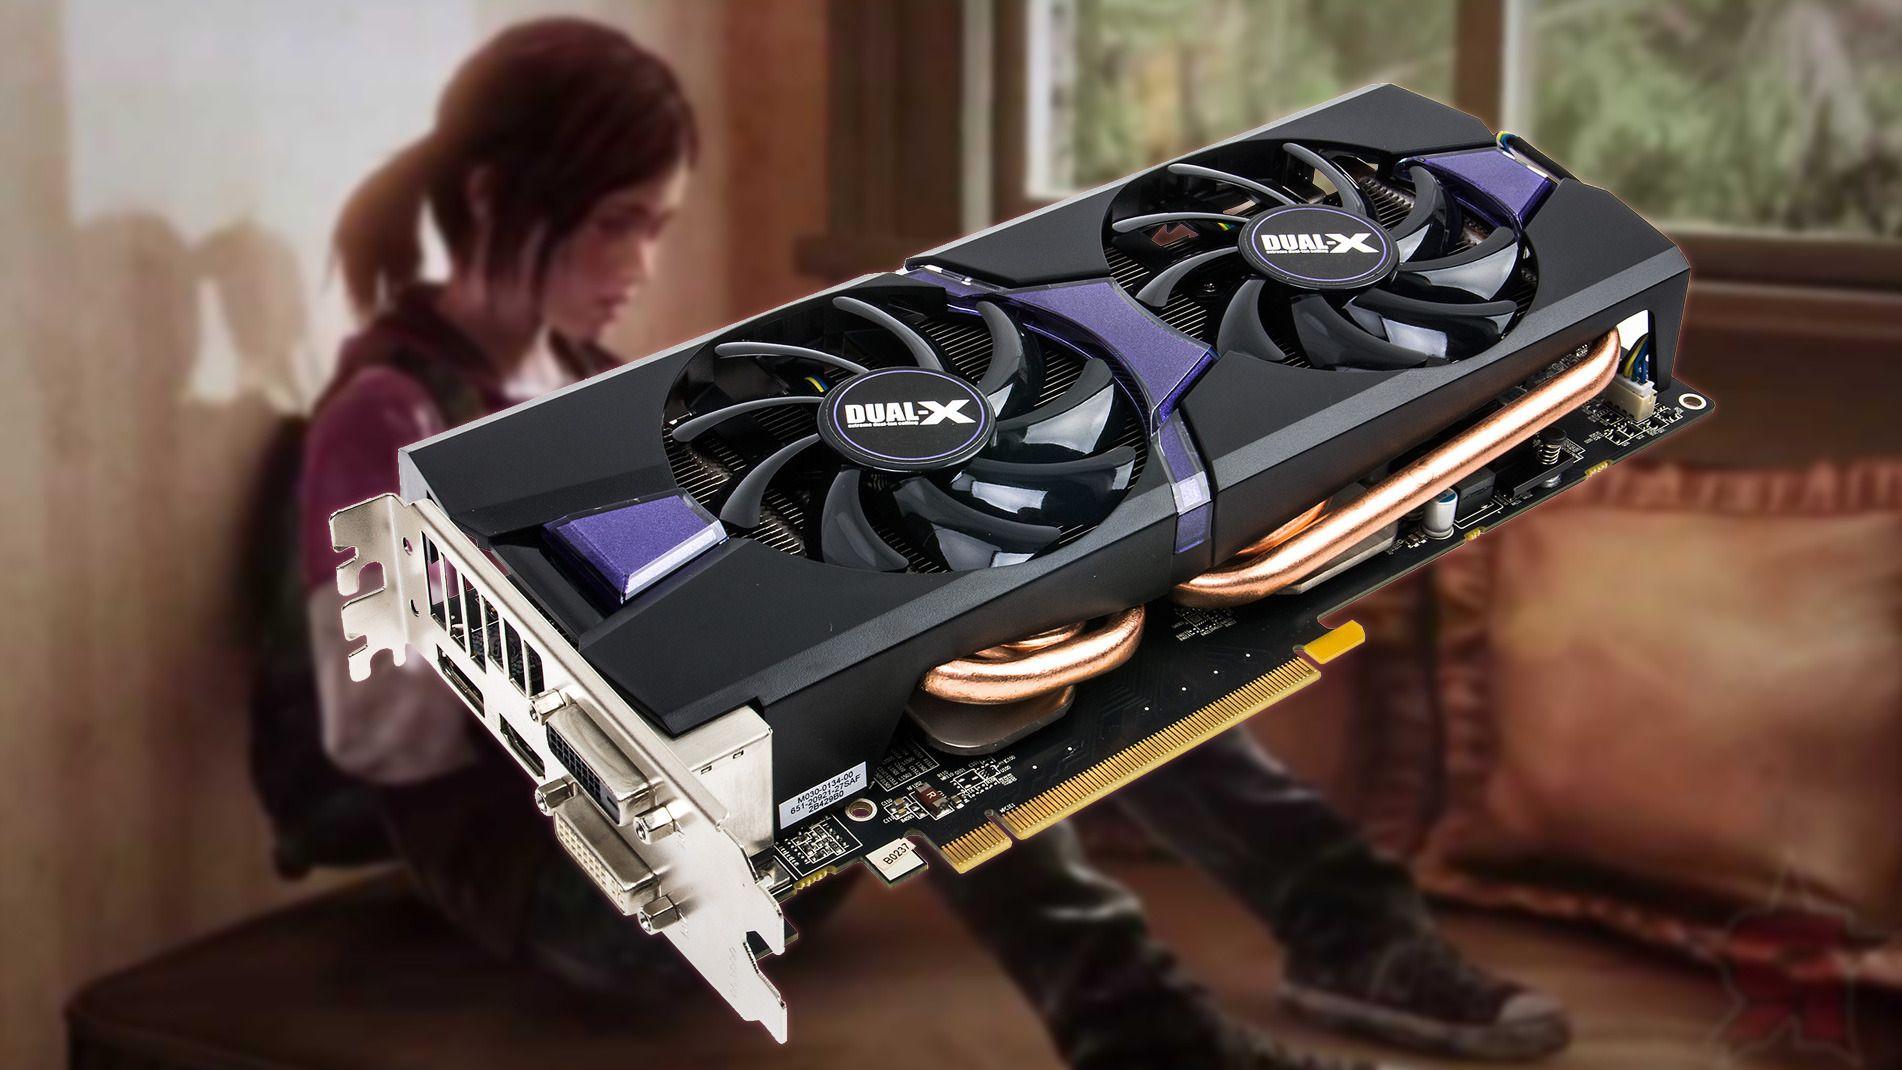 Sapphire Radeon R9 285 OC Dual-X